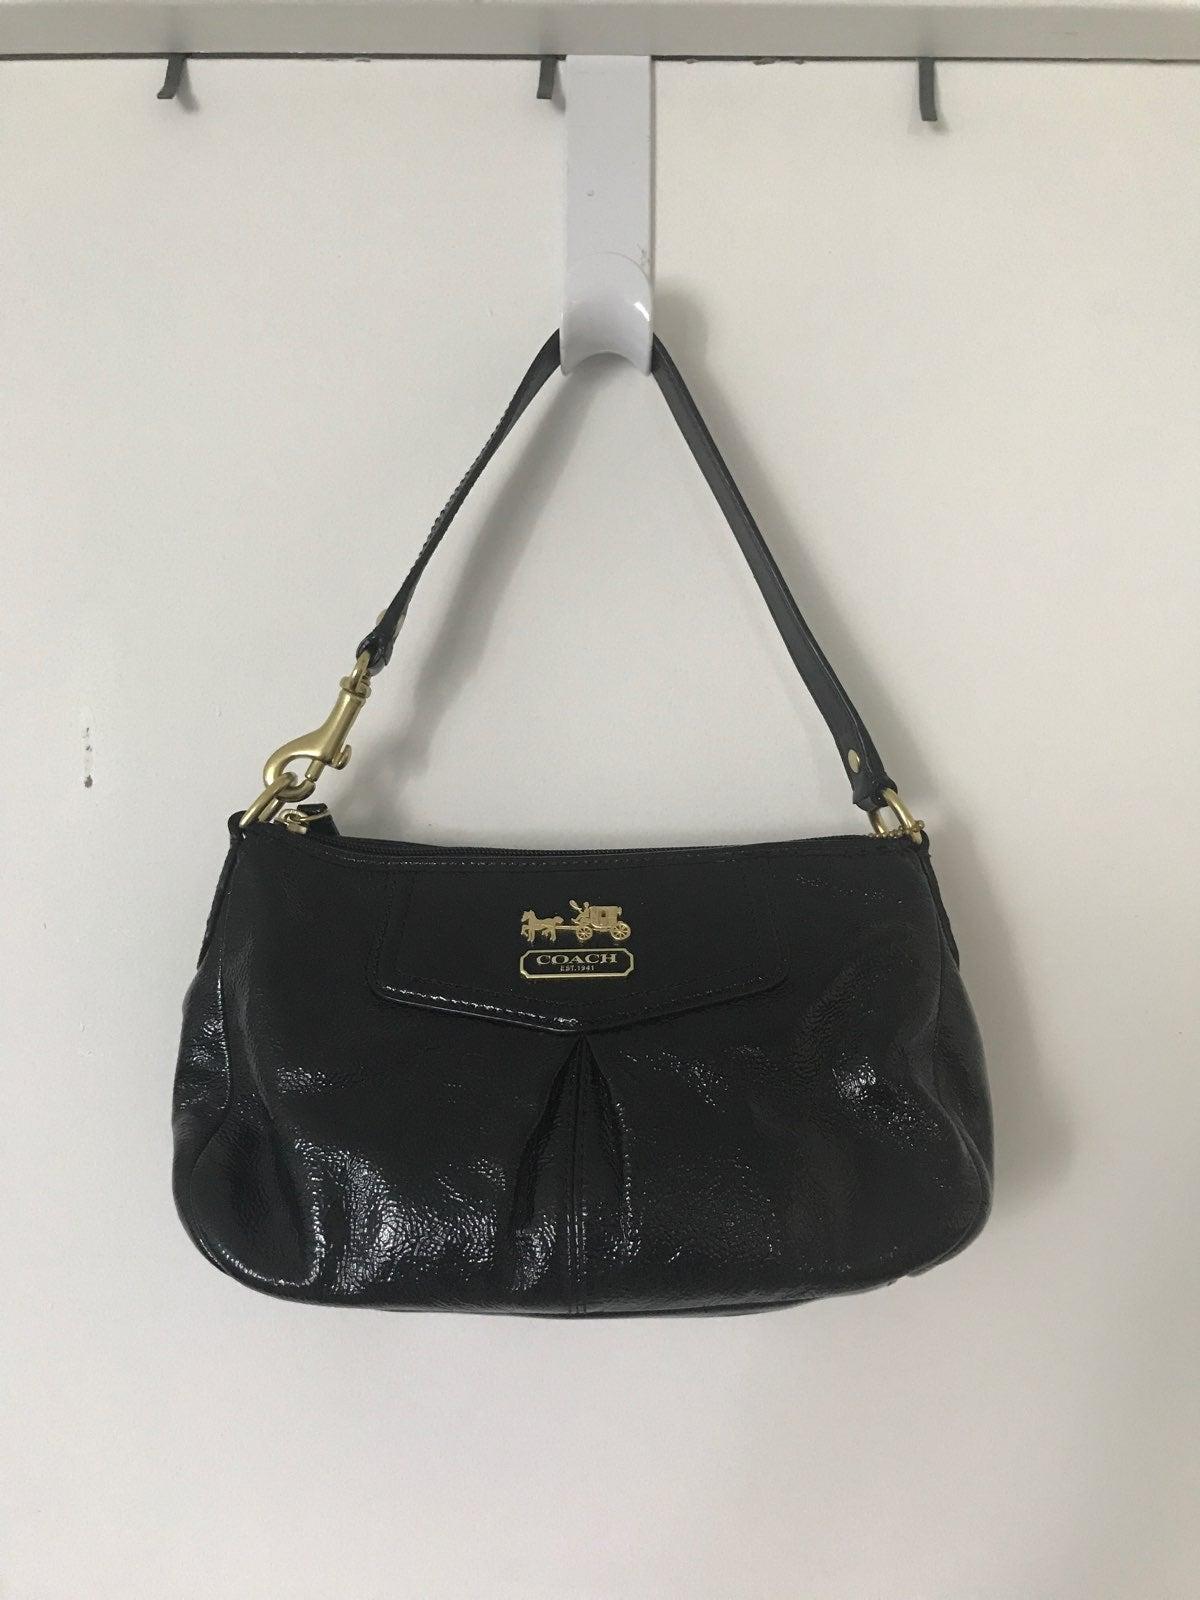 Coach Shoulder Bag - Black Pleather